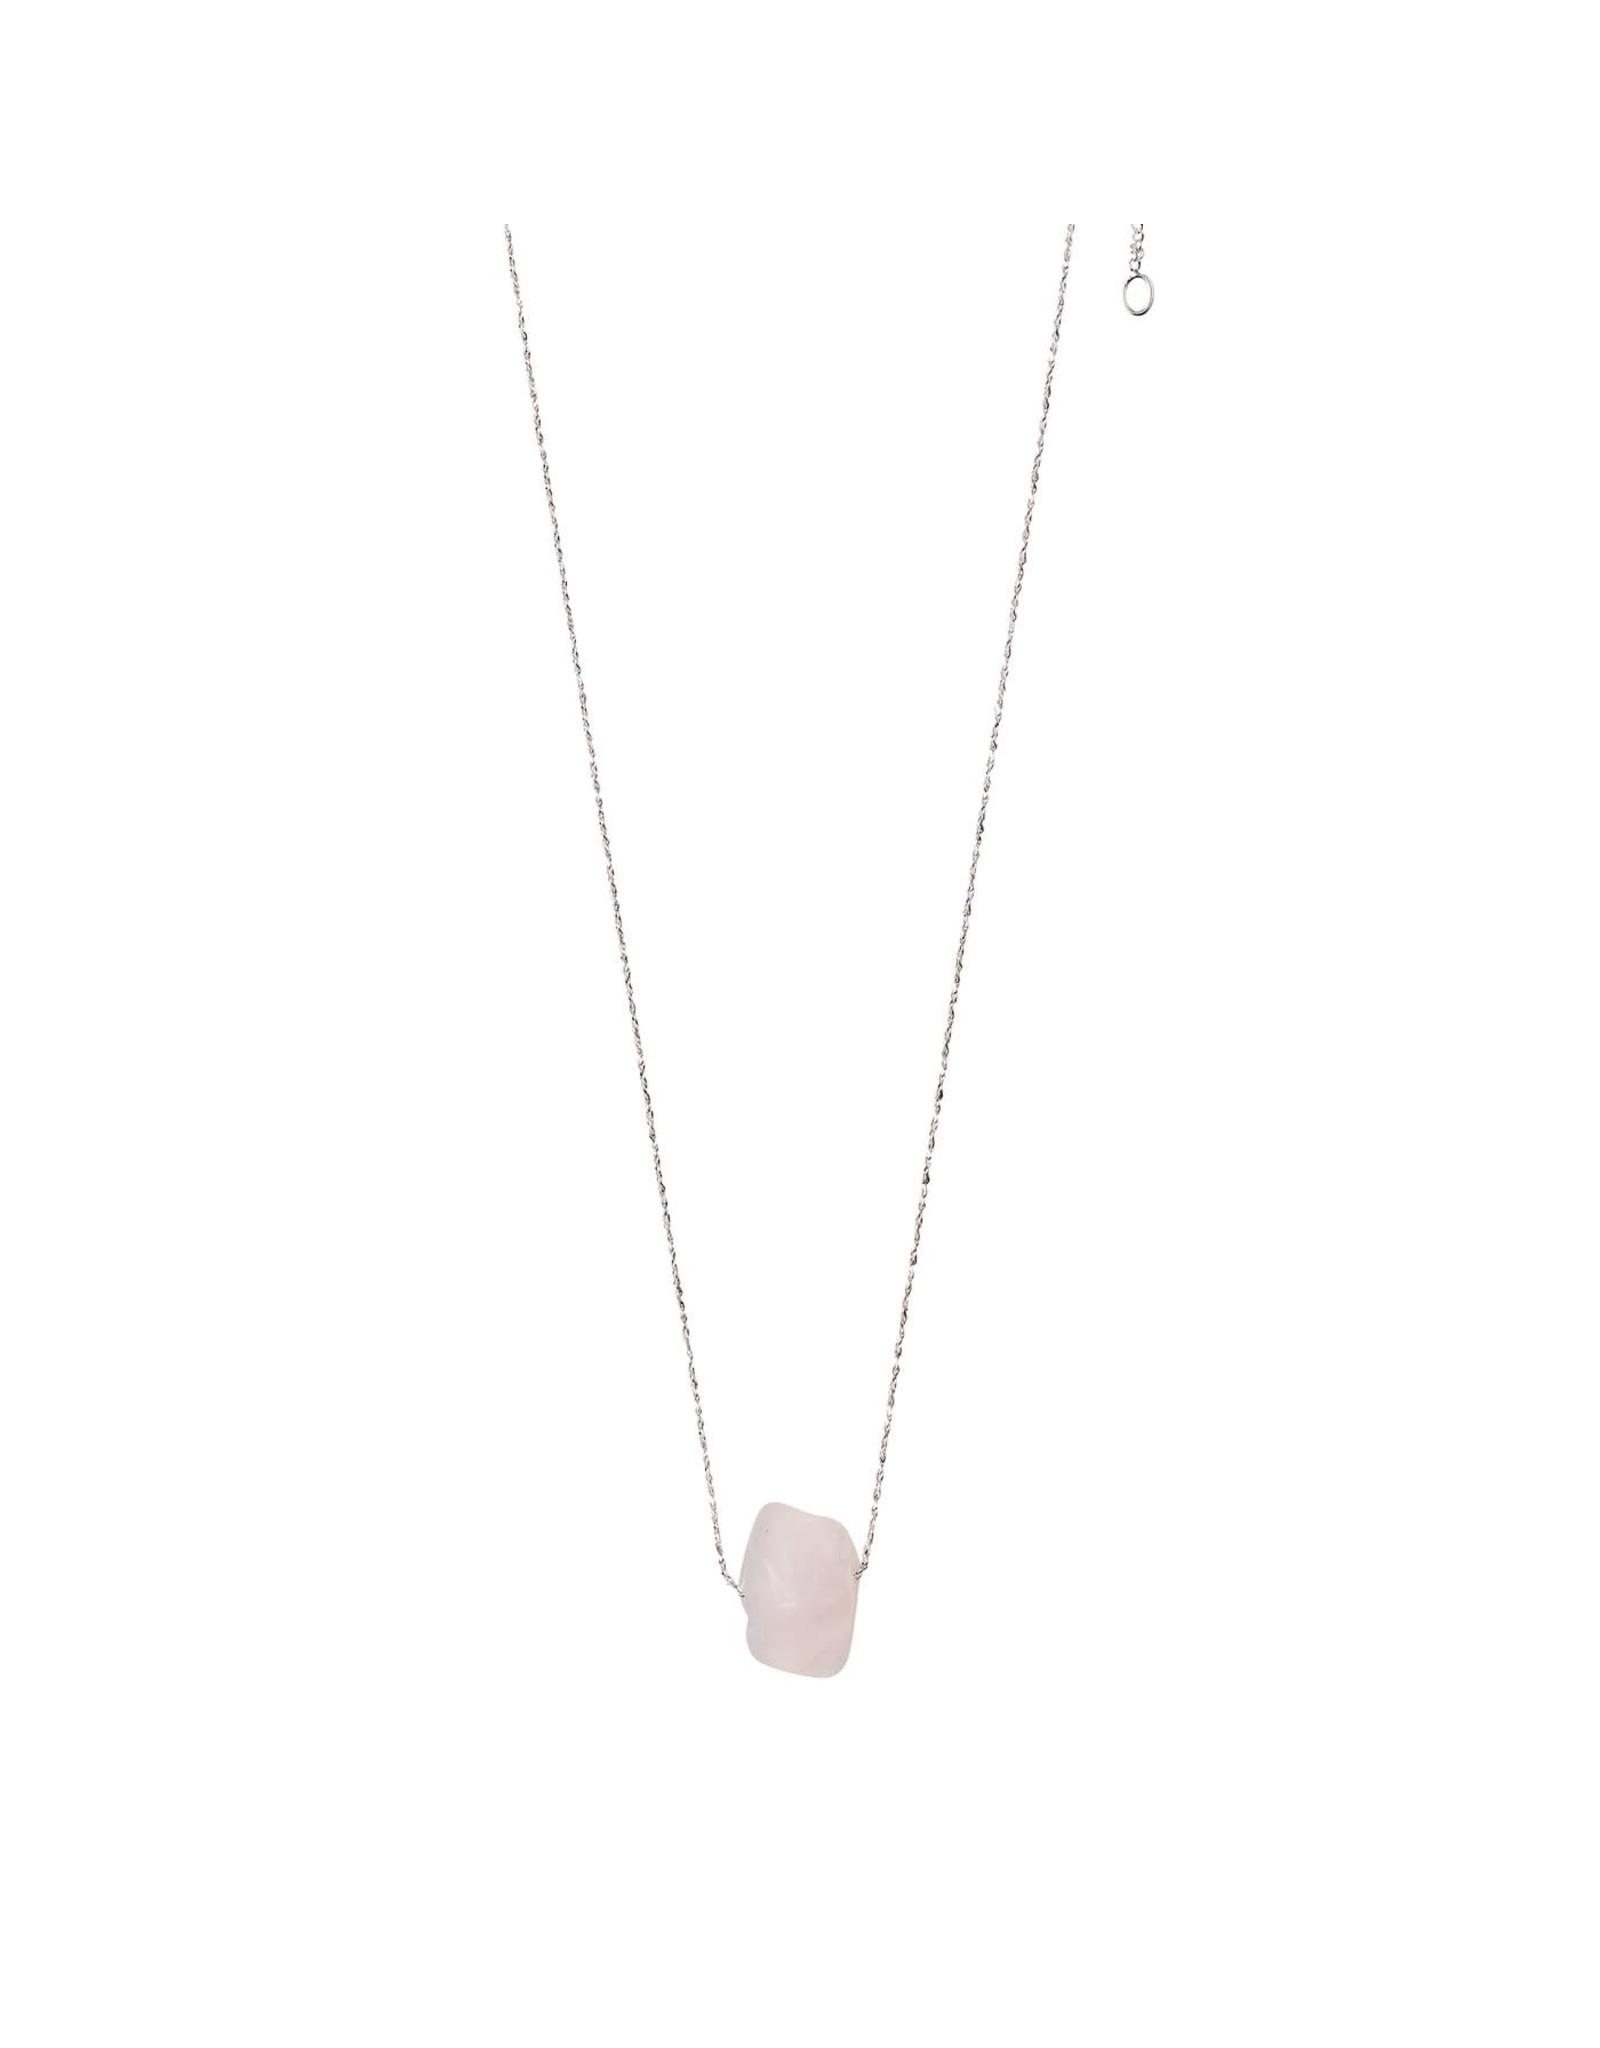 Pilgrim Pilgrim Necklace - Heart Chakra - Silver Plated - Rose Quartz